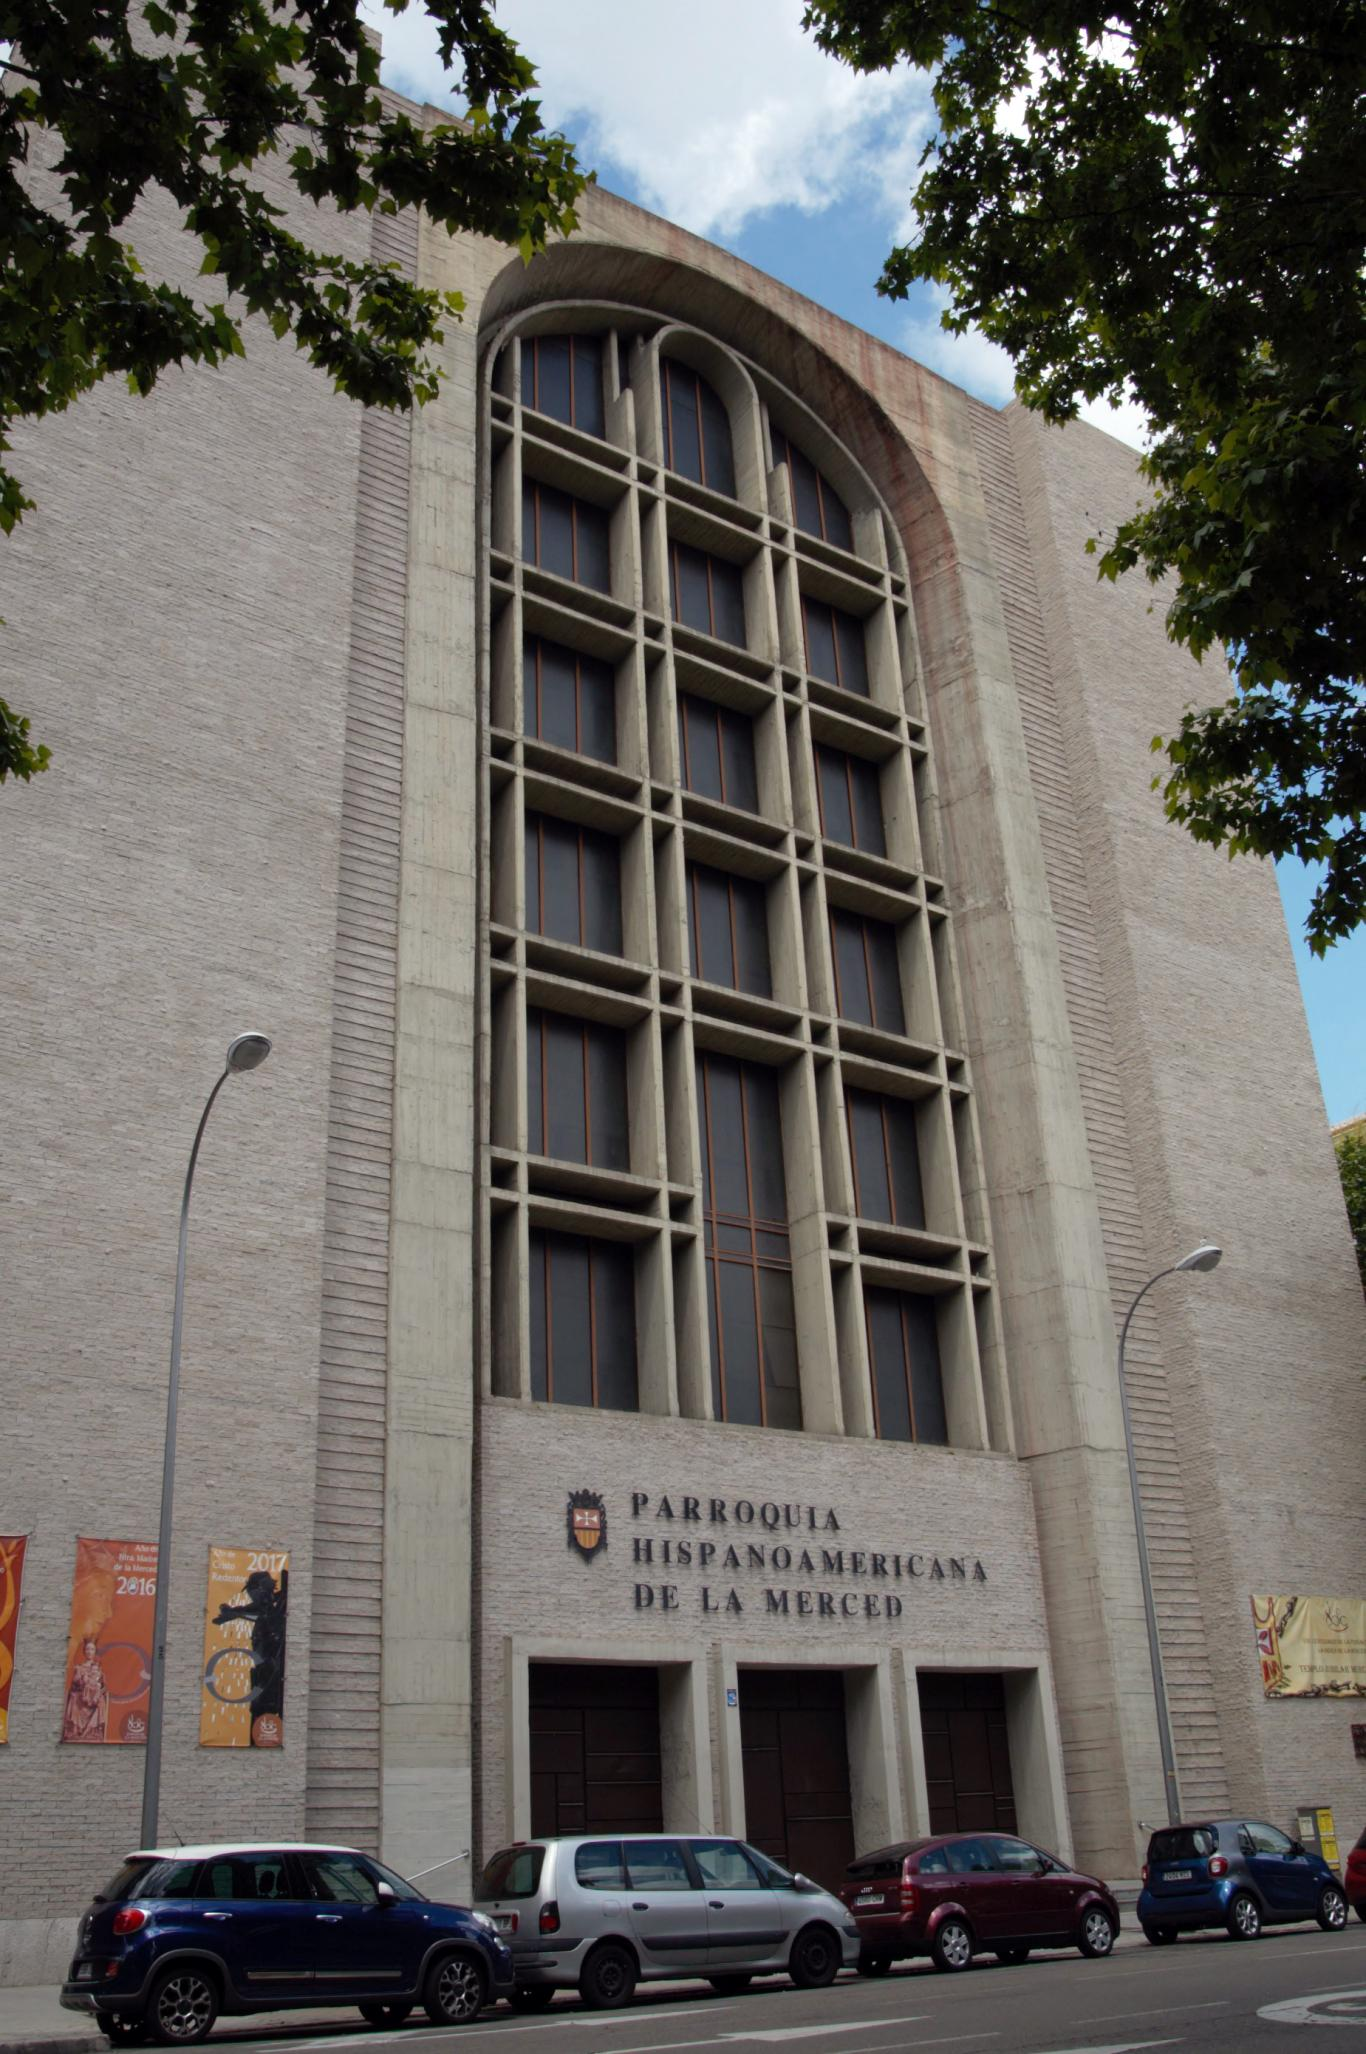 Iglesia Hispanoamericana de la Merced. Madrid.